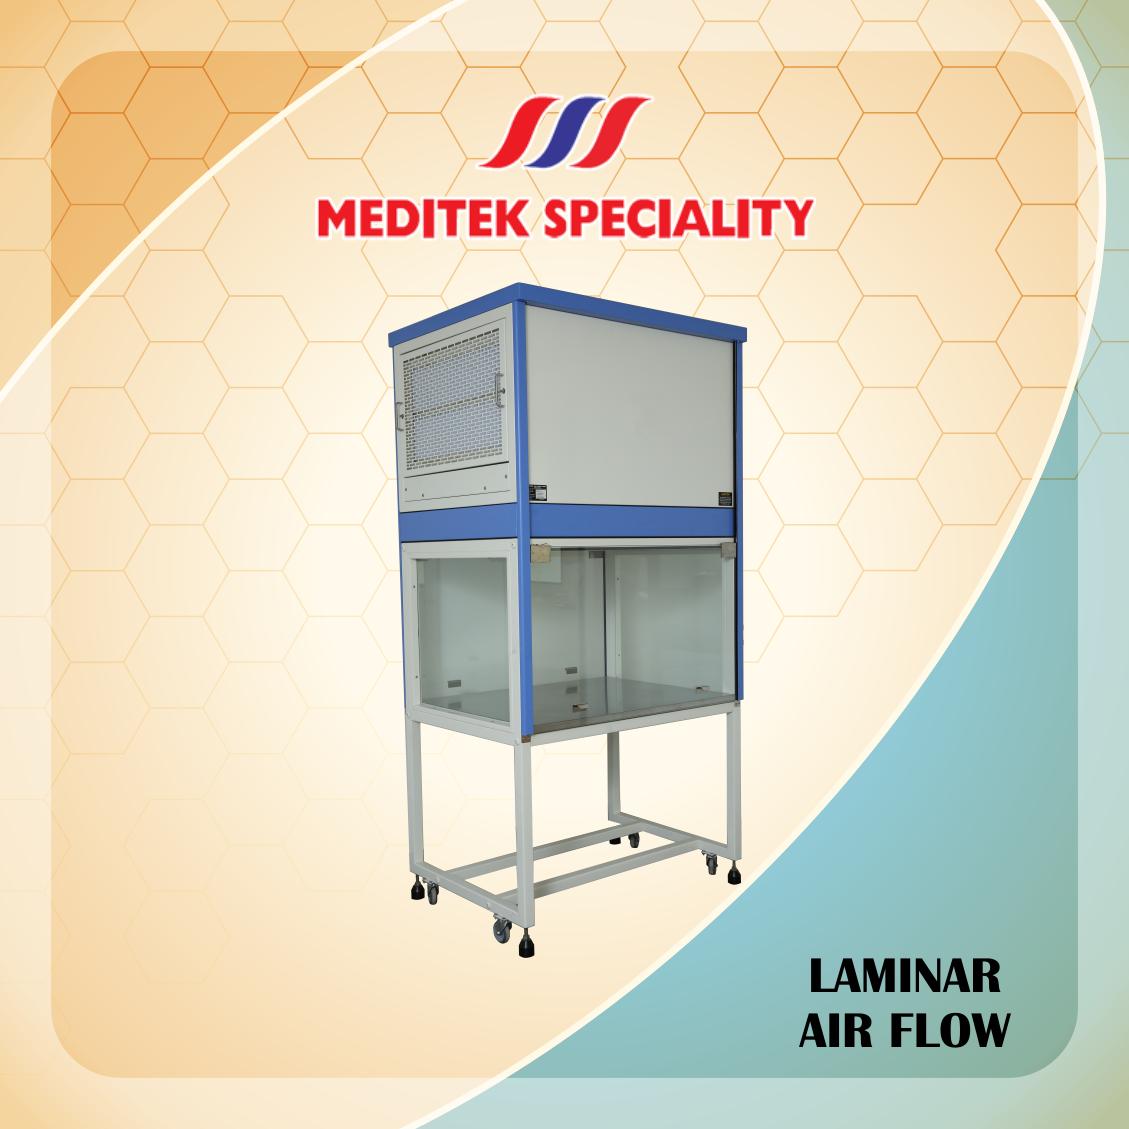 Laminar Air Flow We have made a distinctive mark in health